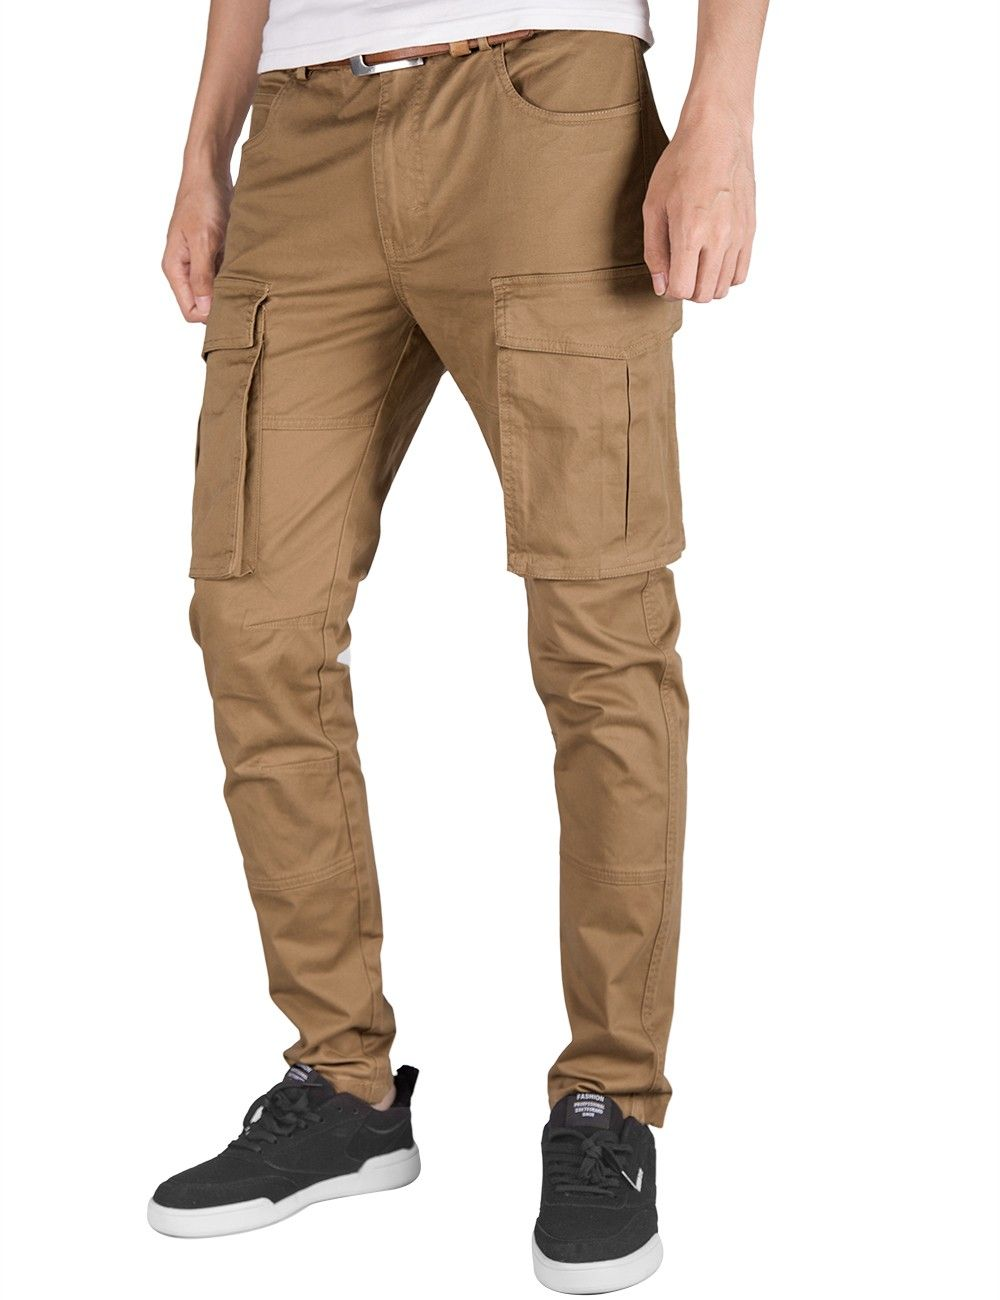 581f37a7b ITALY MORN Men Chino Cargo Jogger Pants Casual Twill Khakis Slim fit Dark  Khaki #menjoggerpants